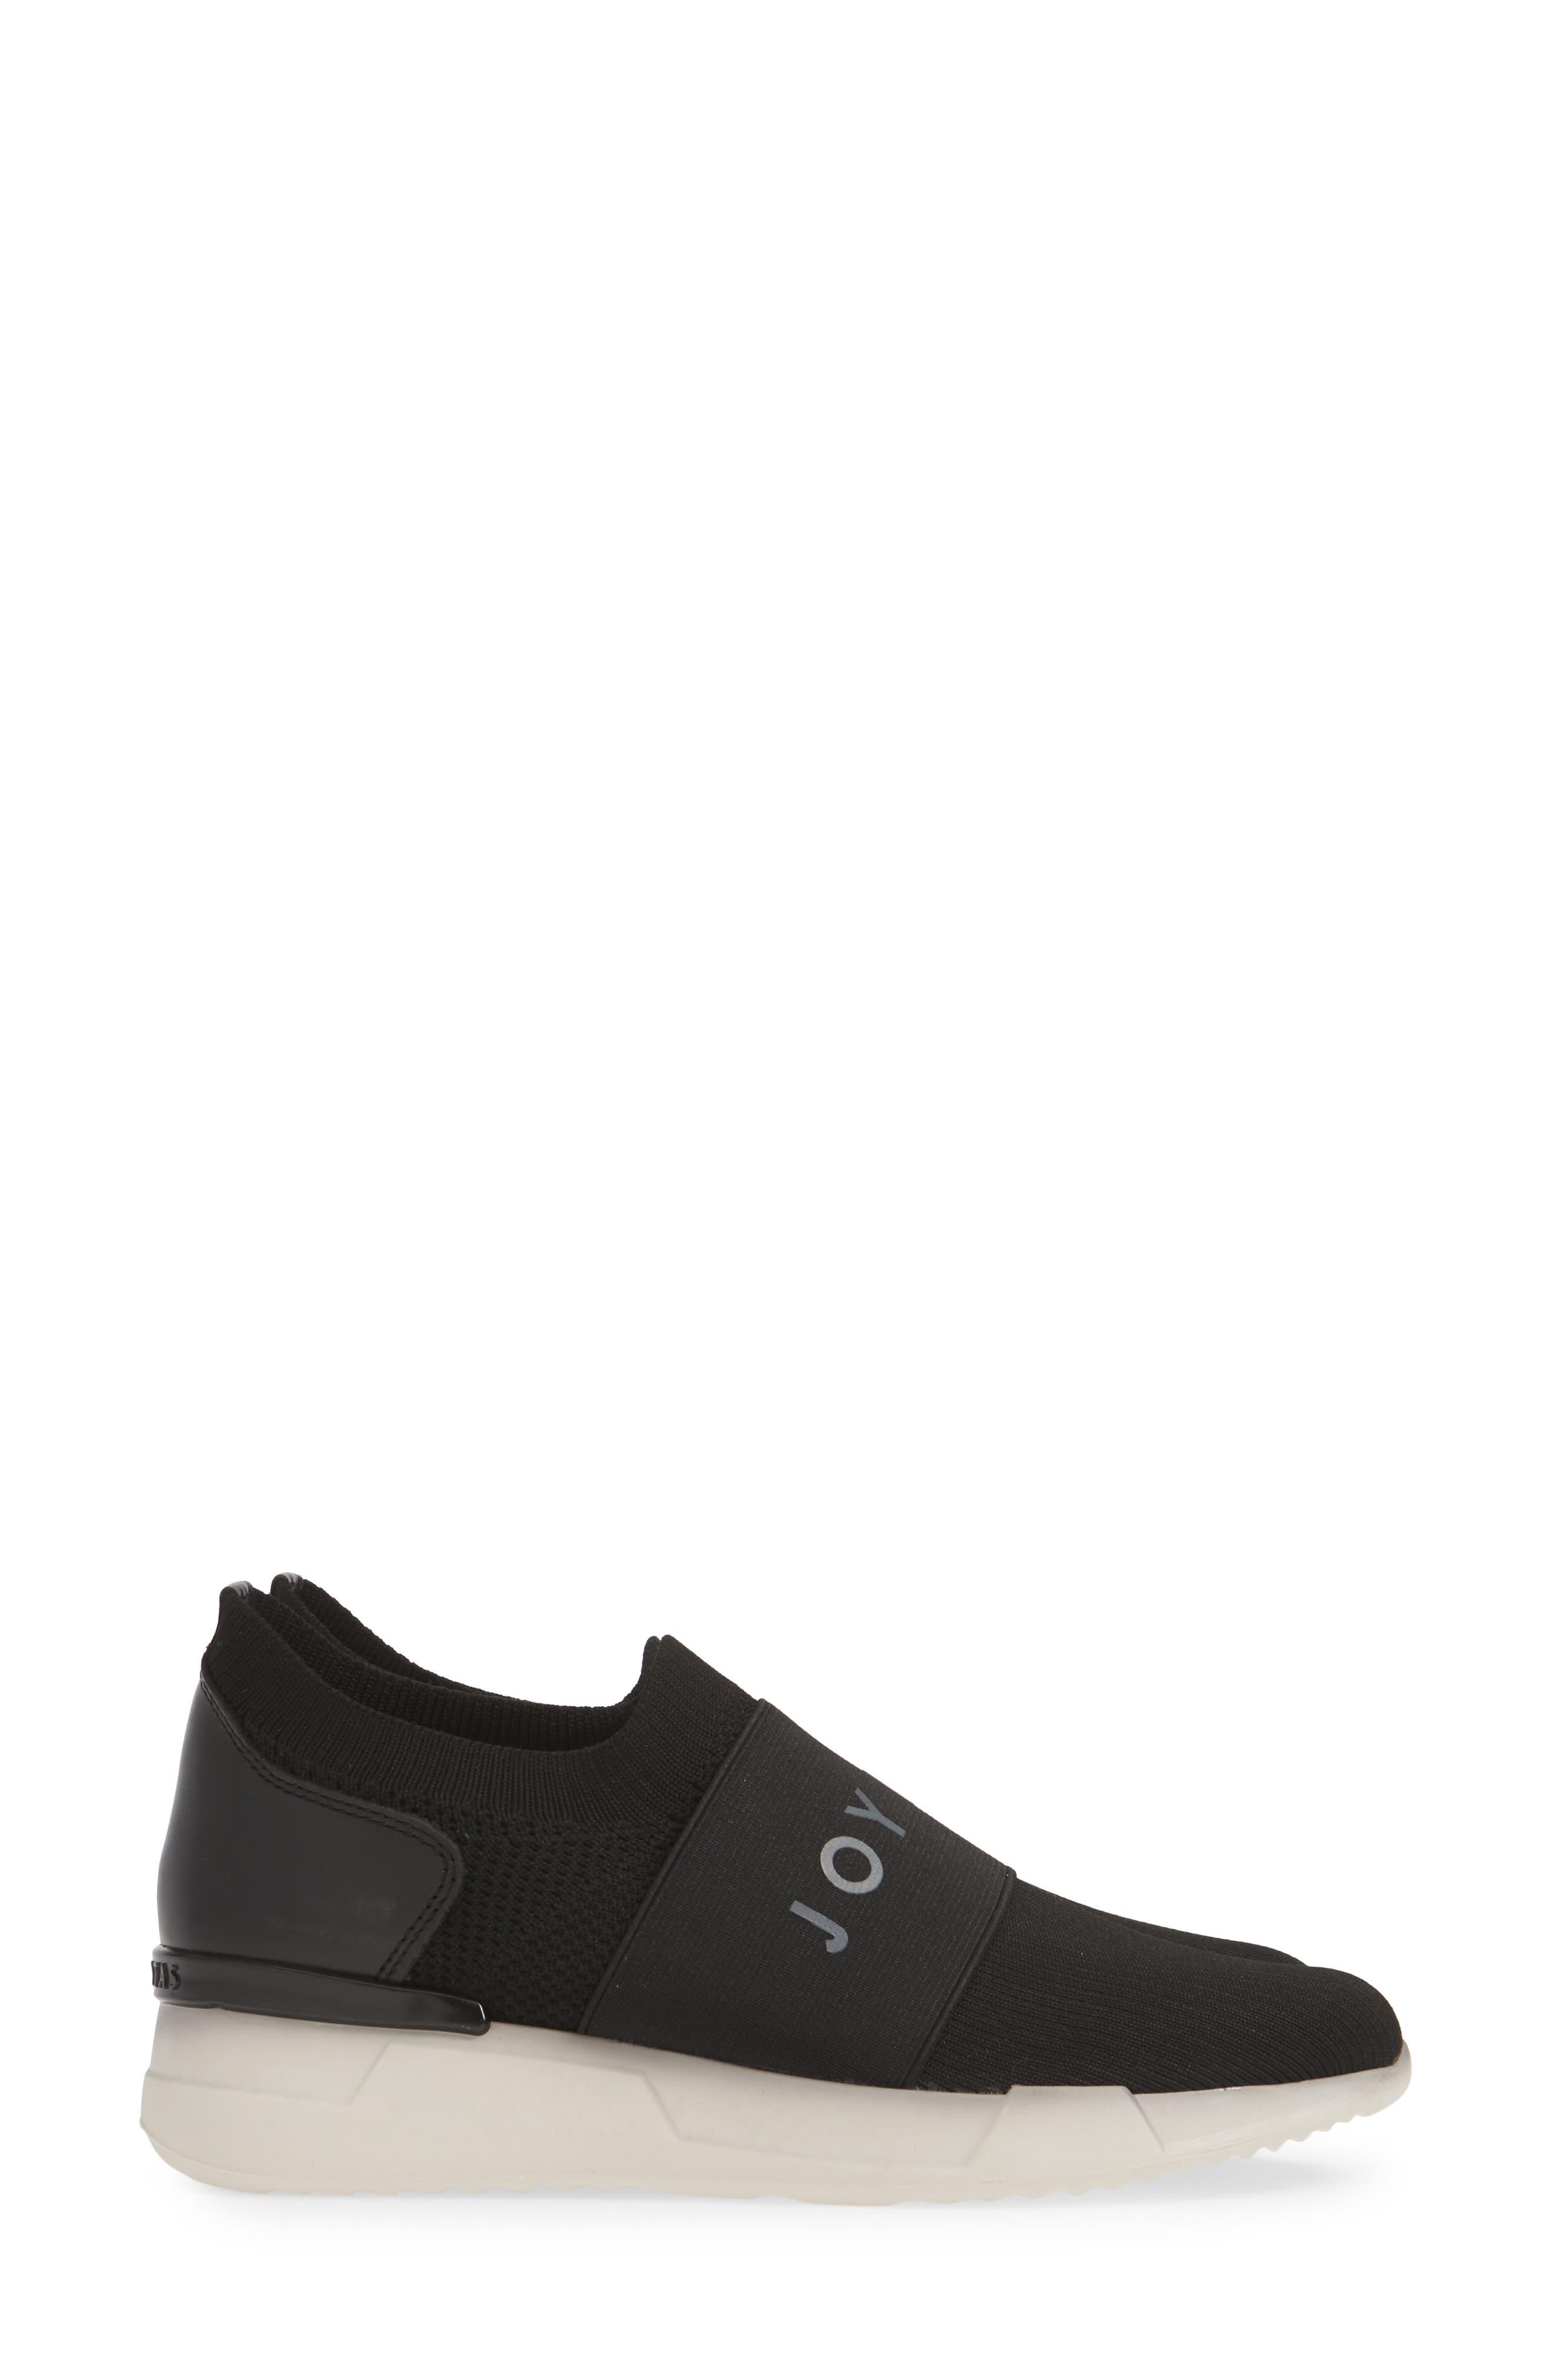 HISPANITAS, Spence Joy Is Choice Sock-Knit Sneaker, Alternate thumbnail 4, color, BLACK/ WHITE FABRIC